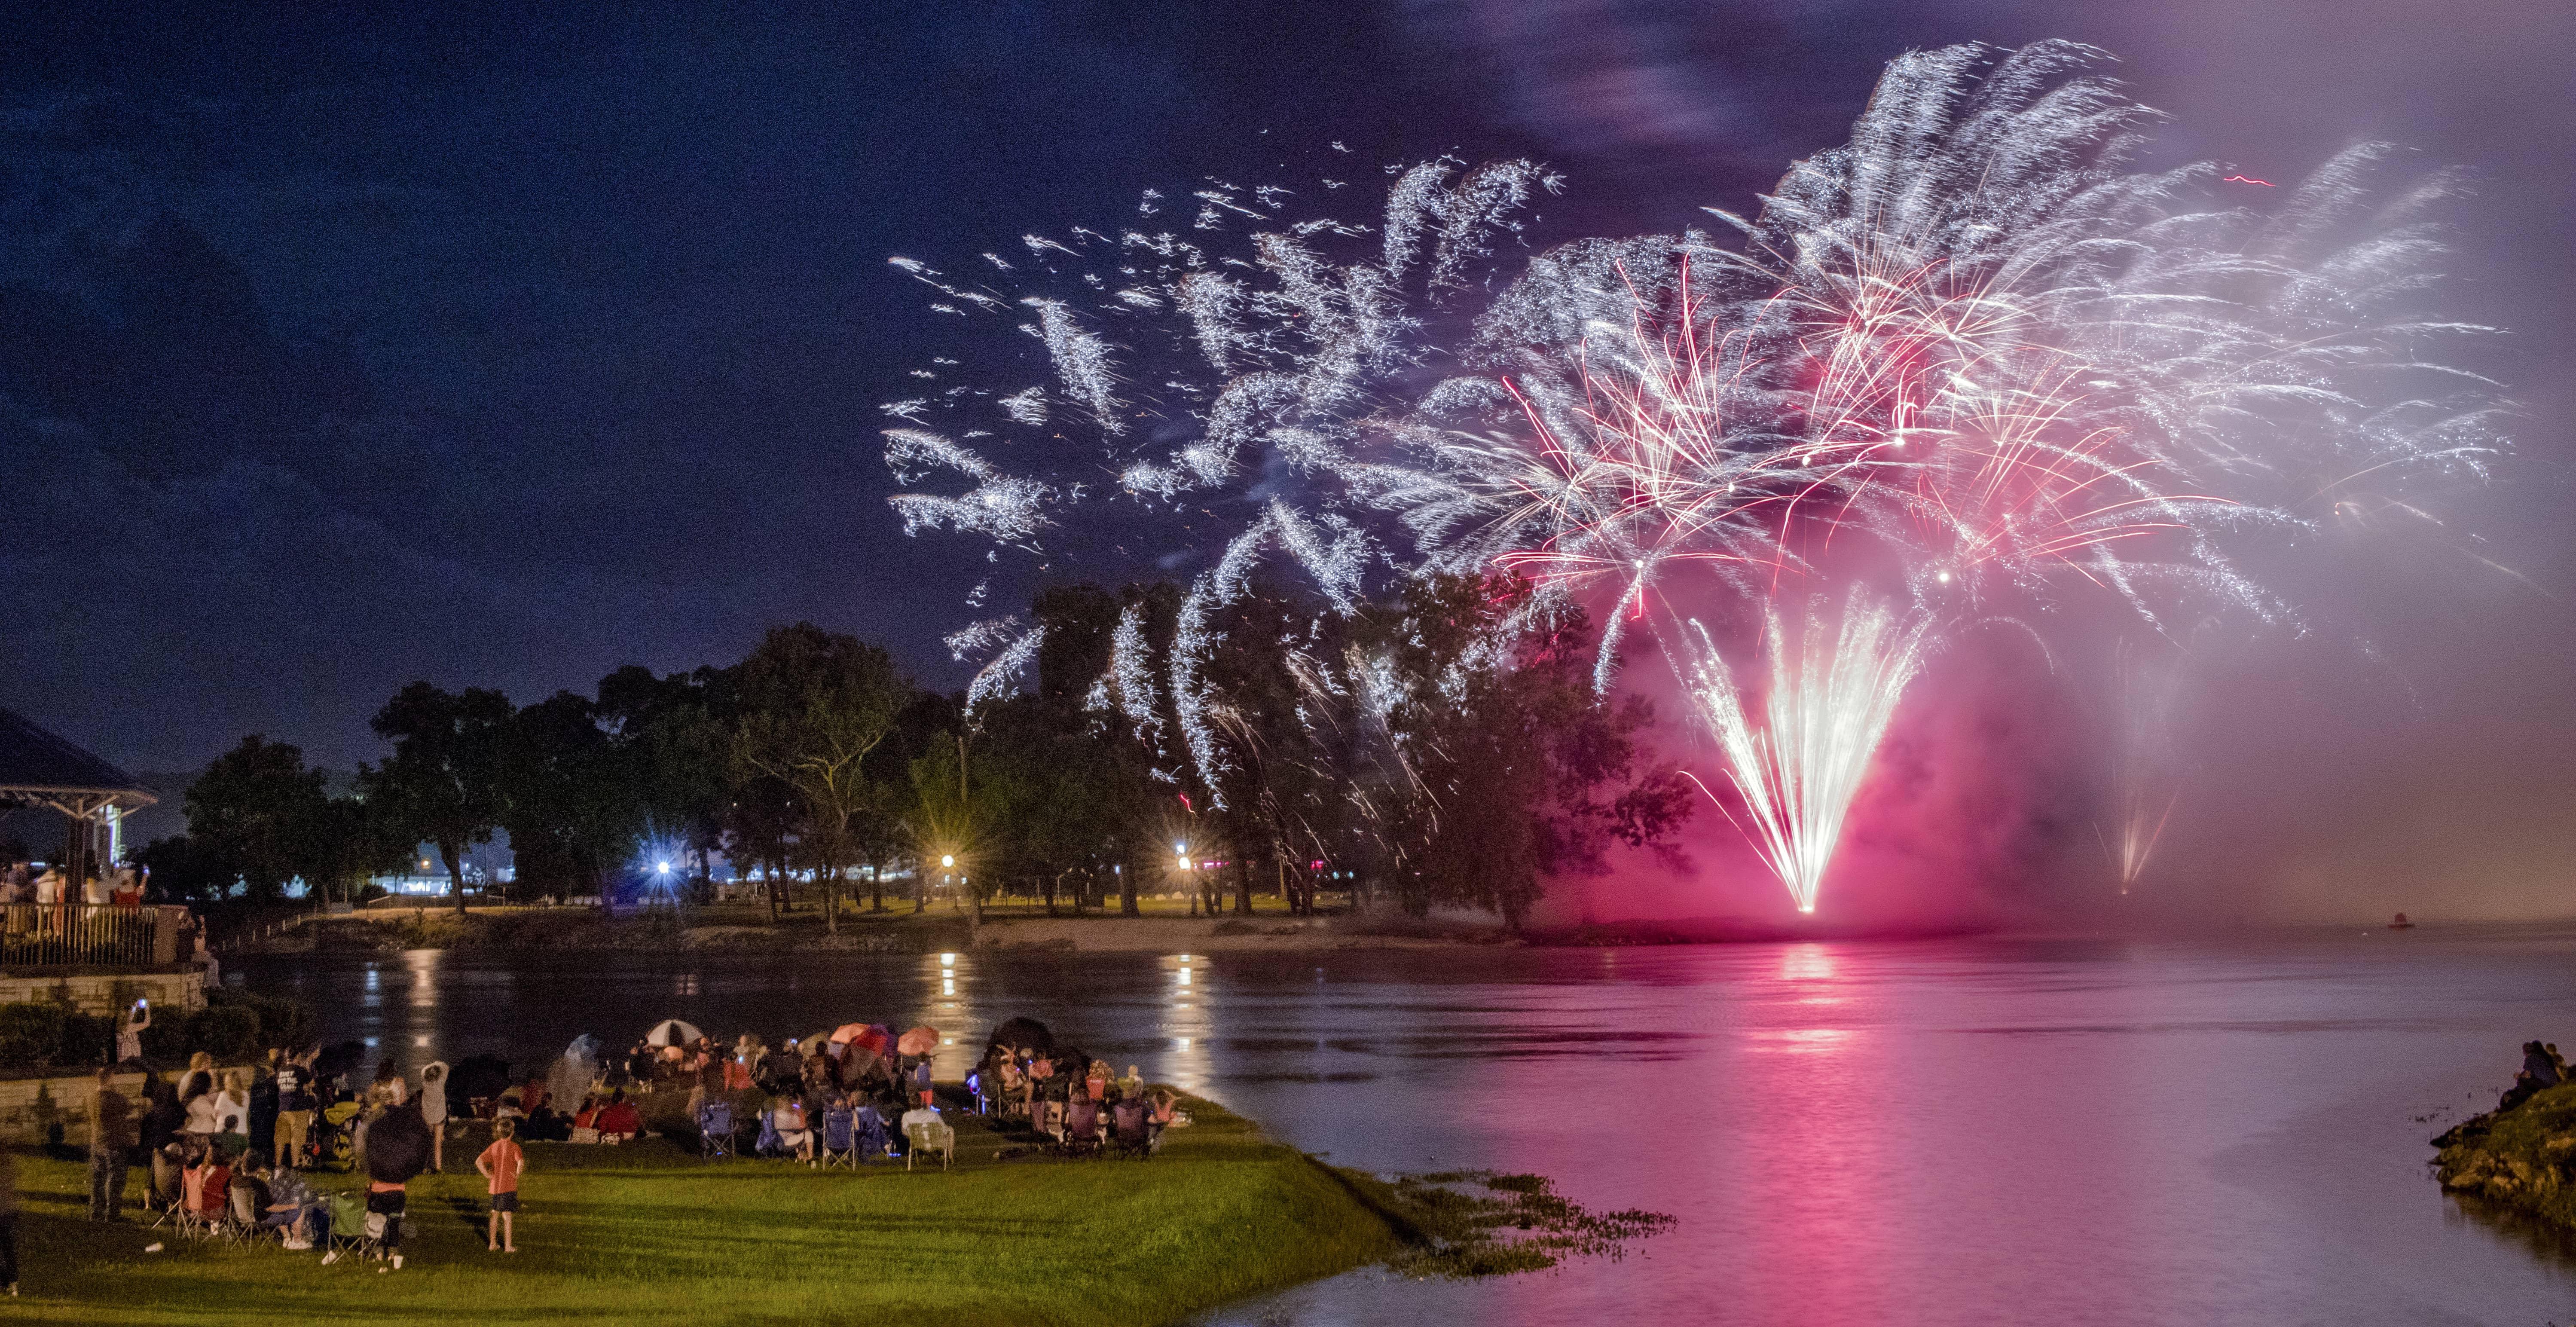 _Fireworks 2017 - 08.jpg